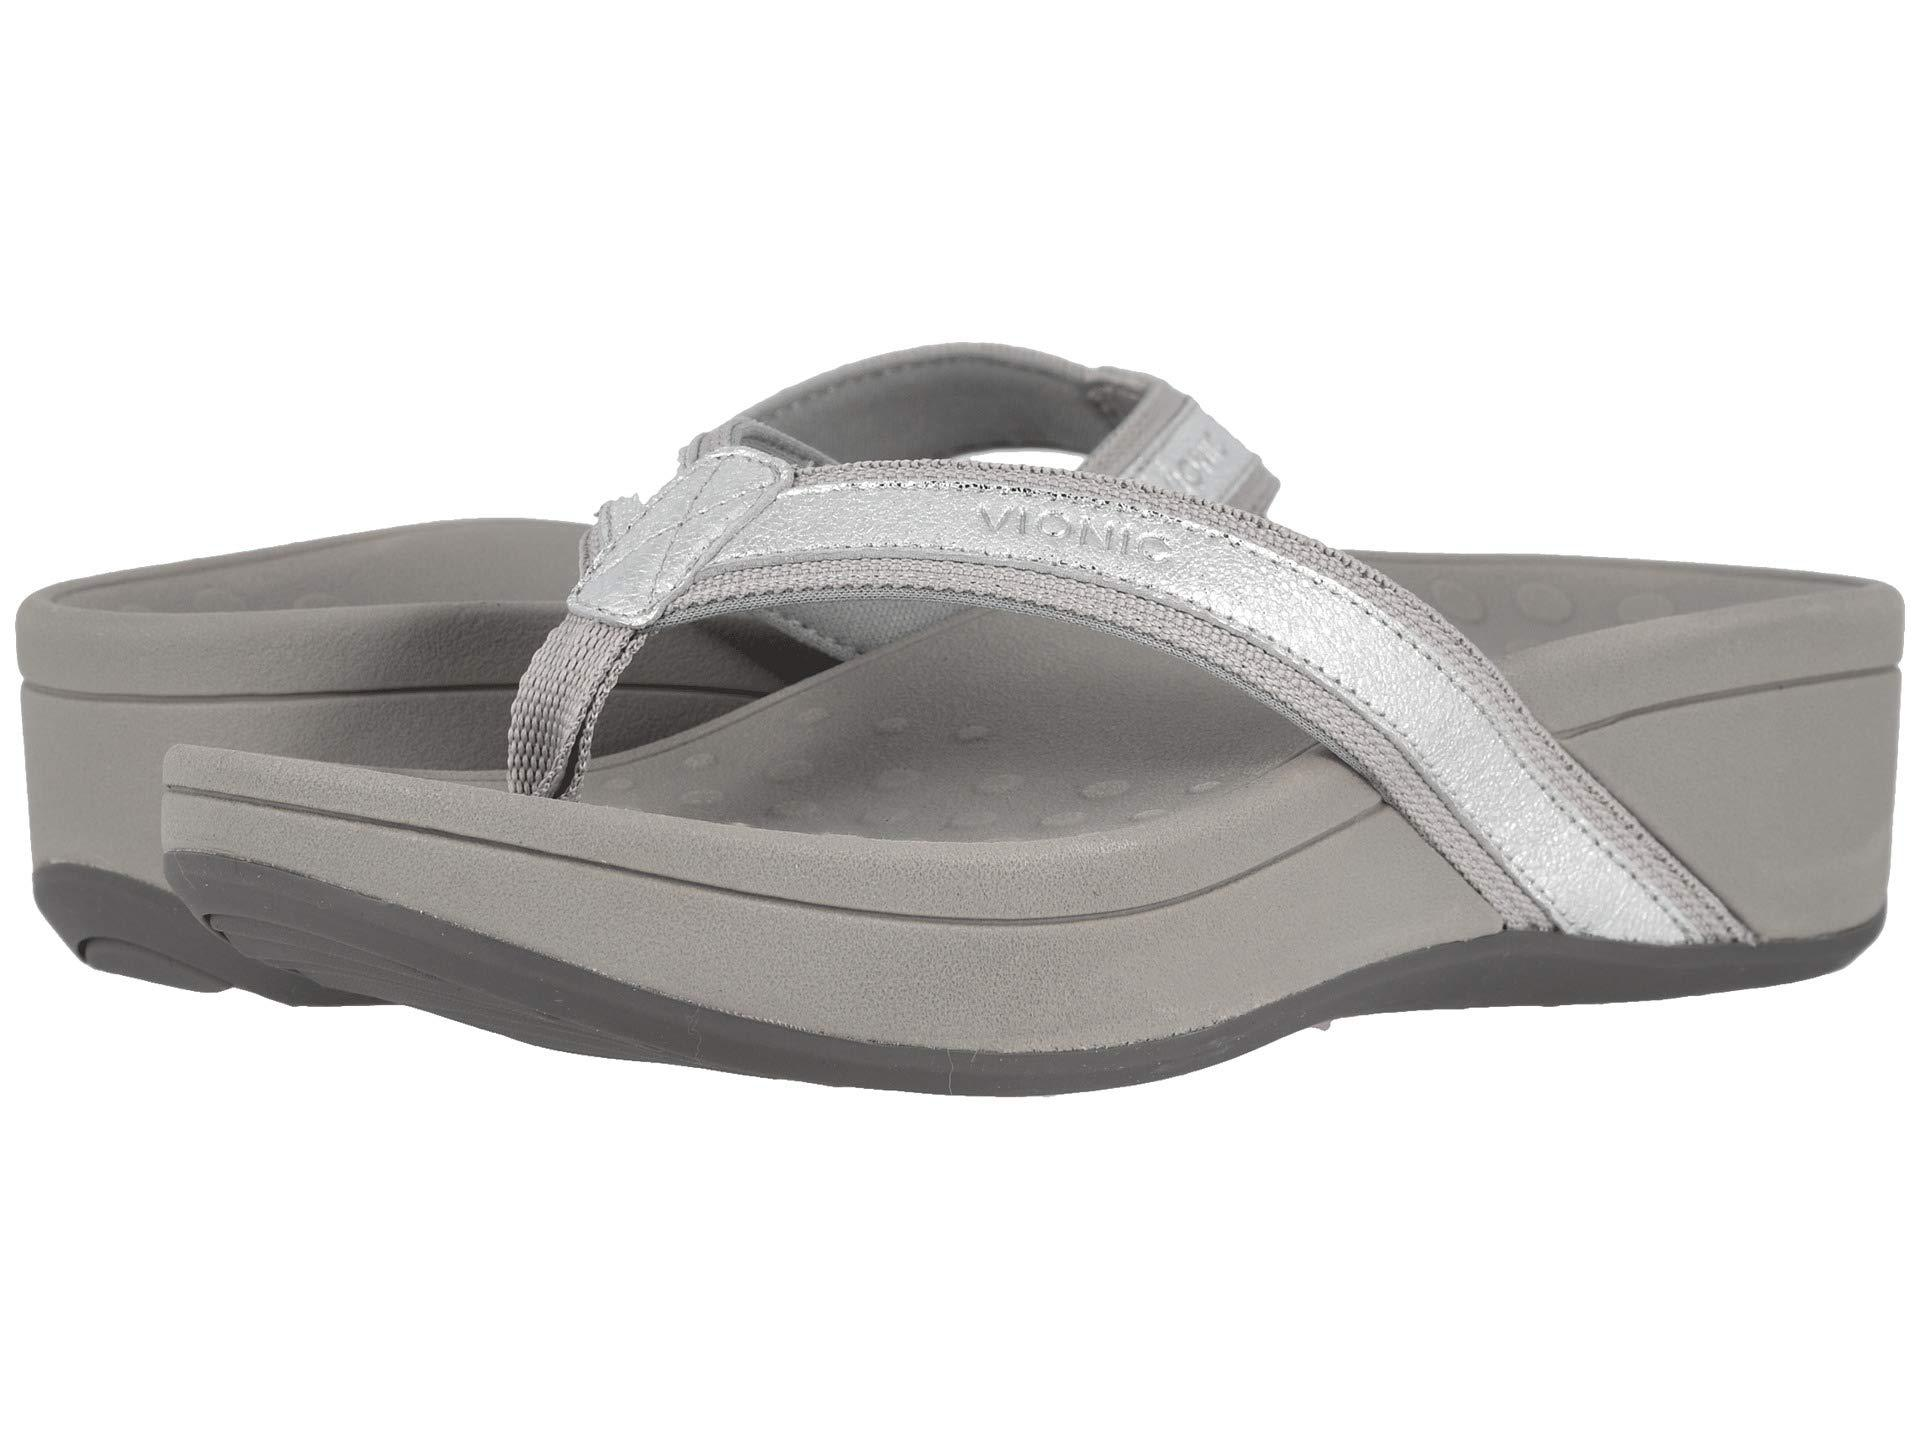 713dbe35391 Lyst - Vionic High Tide Metallic (silver) Women s Sandals in Metallic